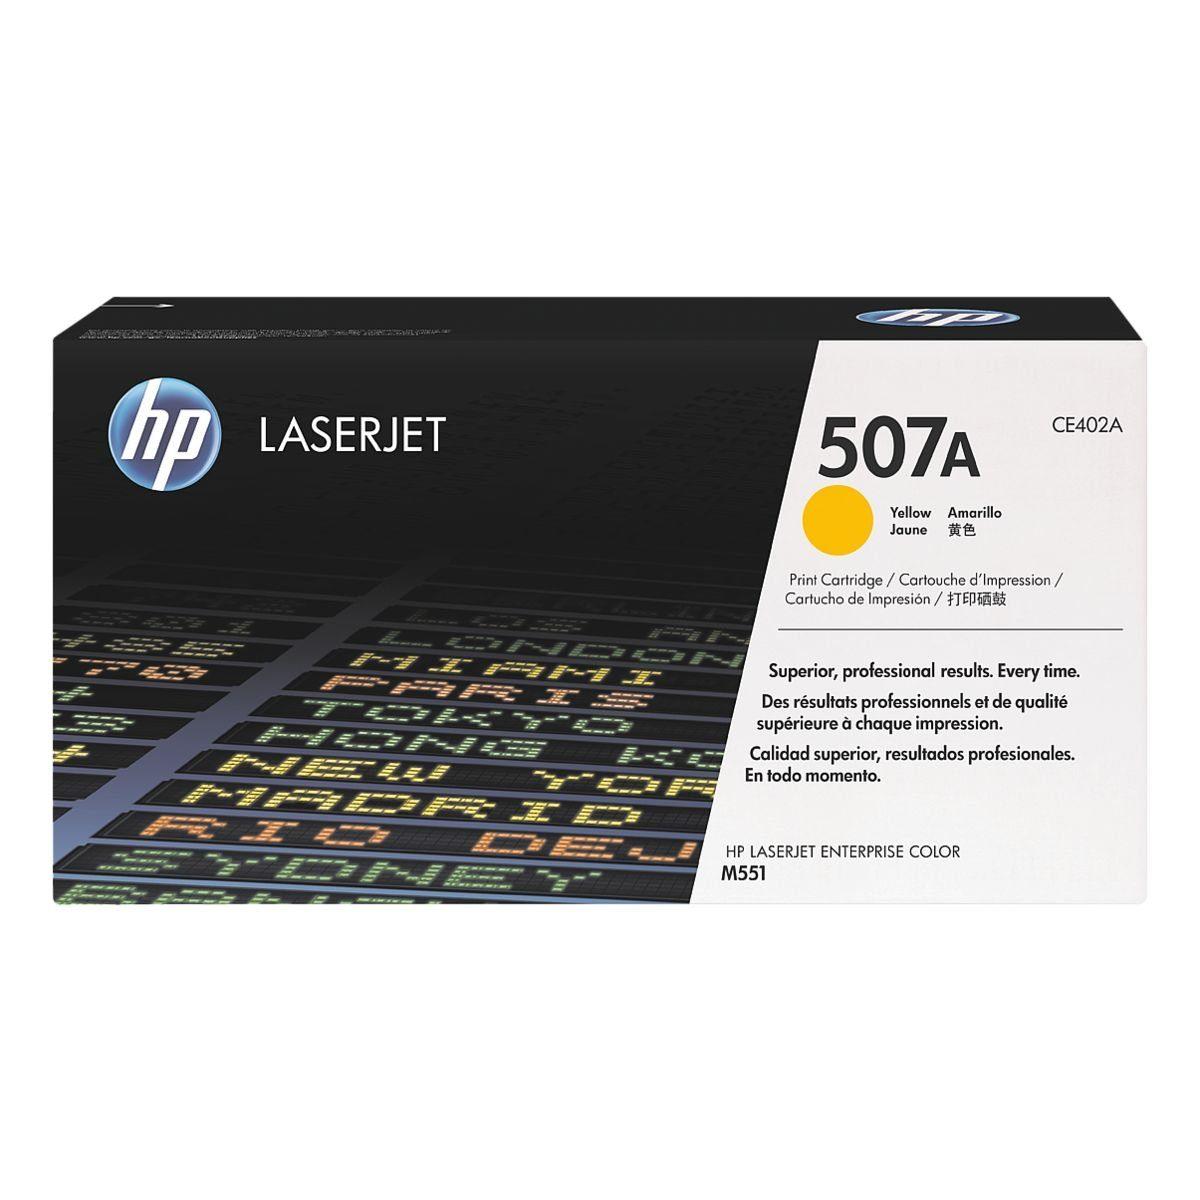 HP Druckkassette »CE402A« 507A